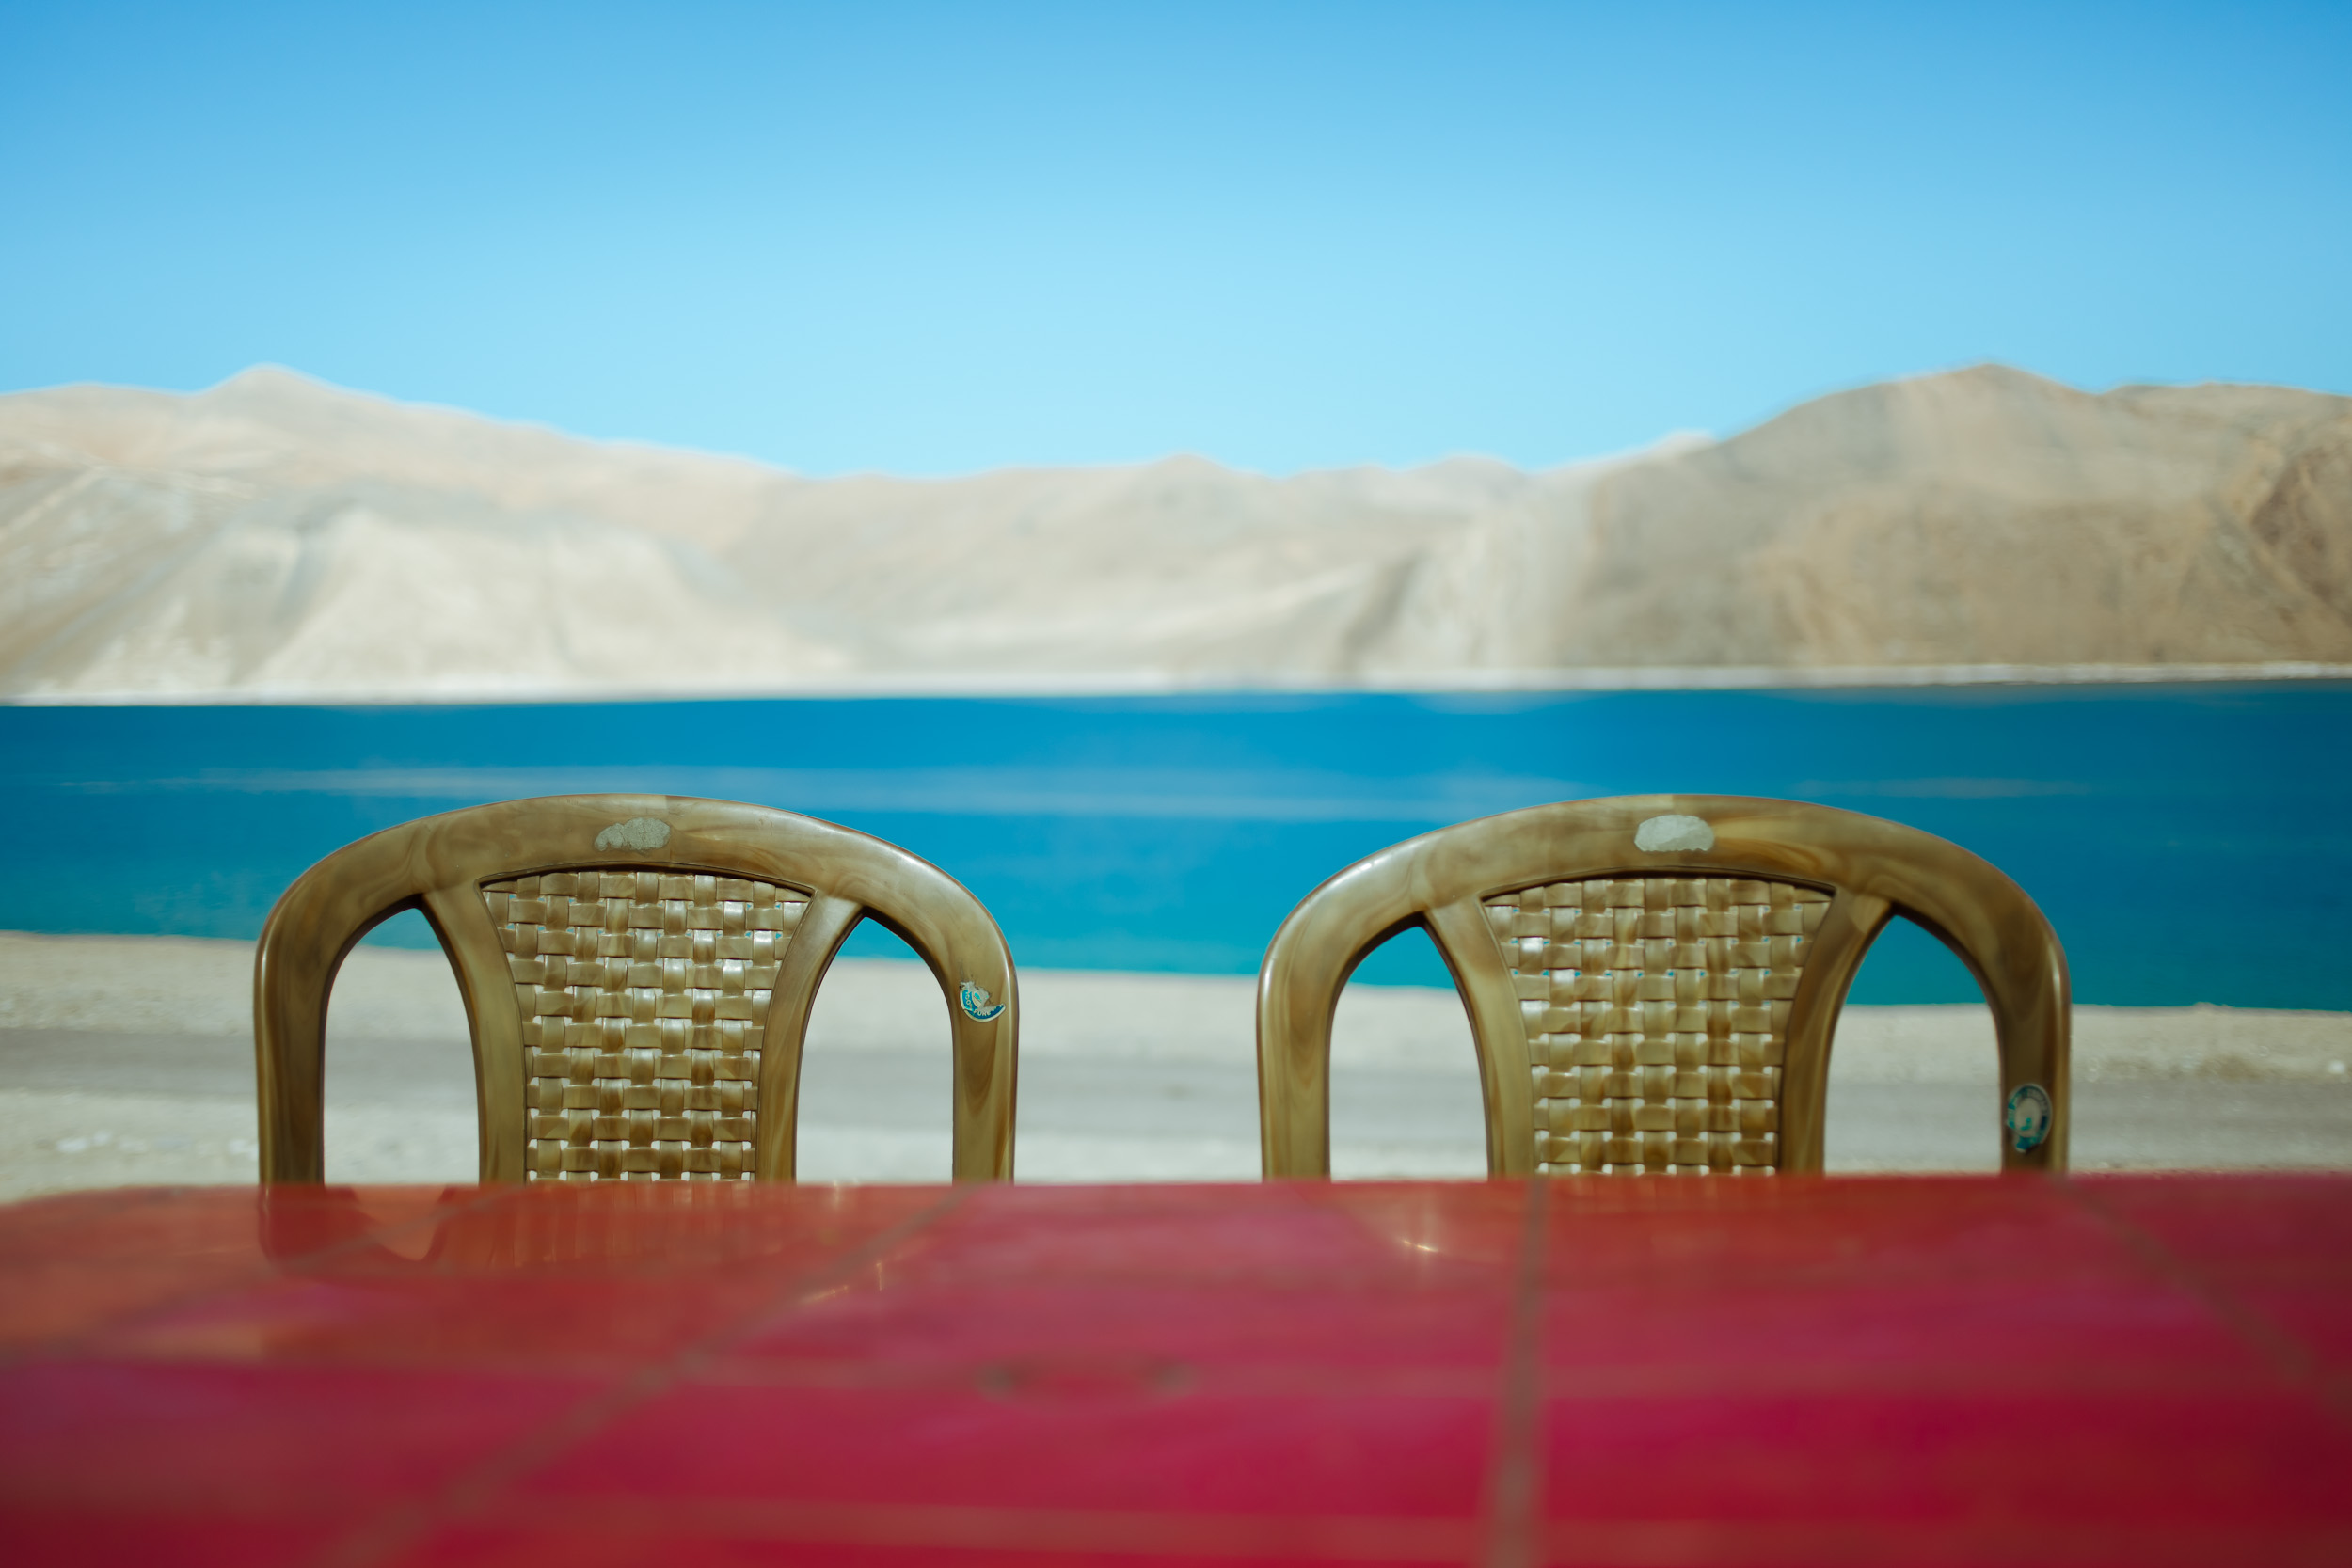 Sindhur_Photography_Travel_Landscape_Ladakh-24.JPG